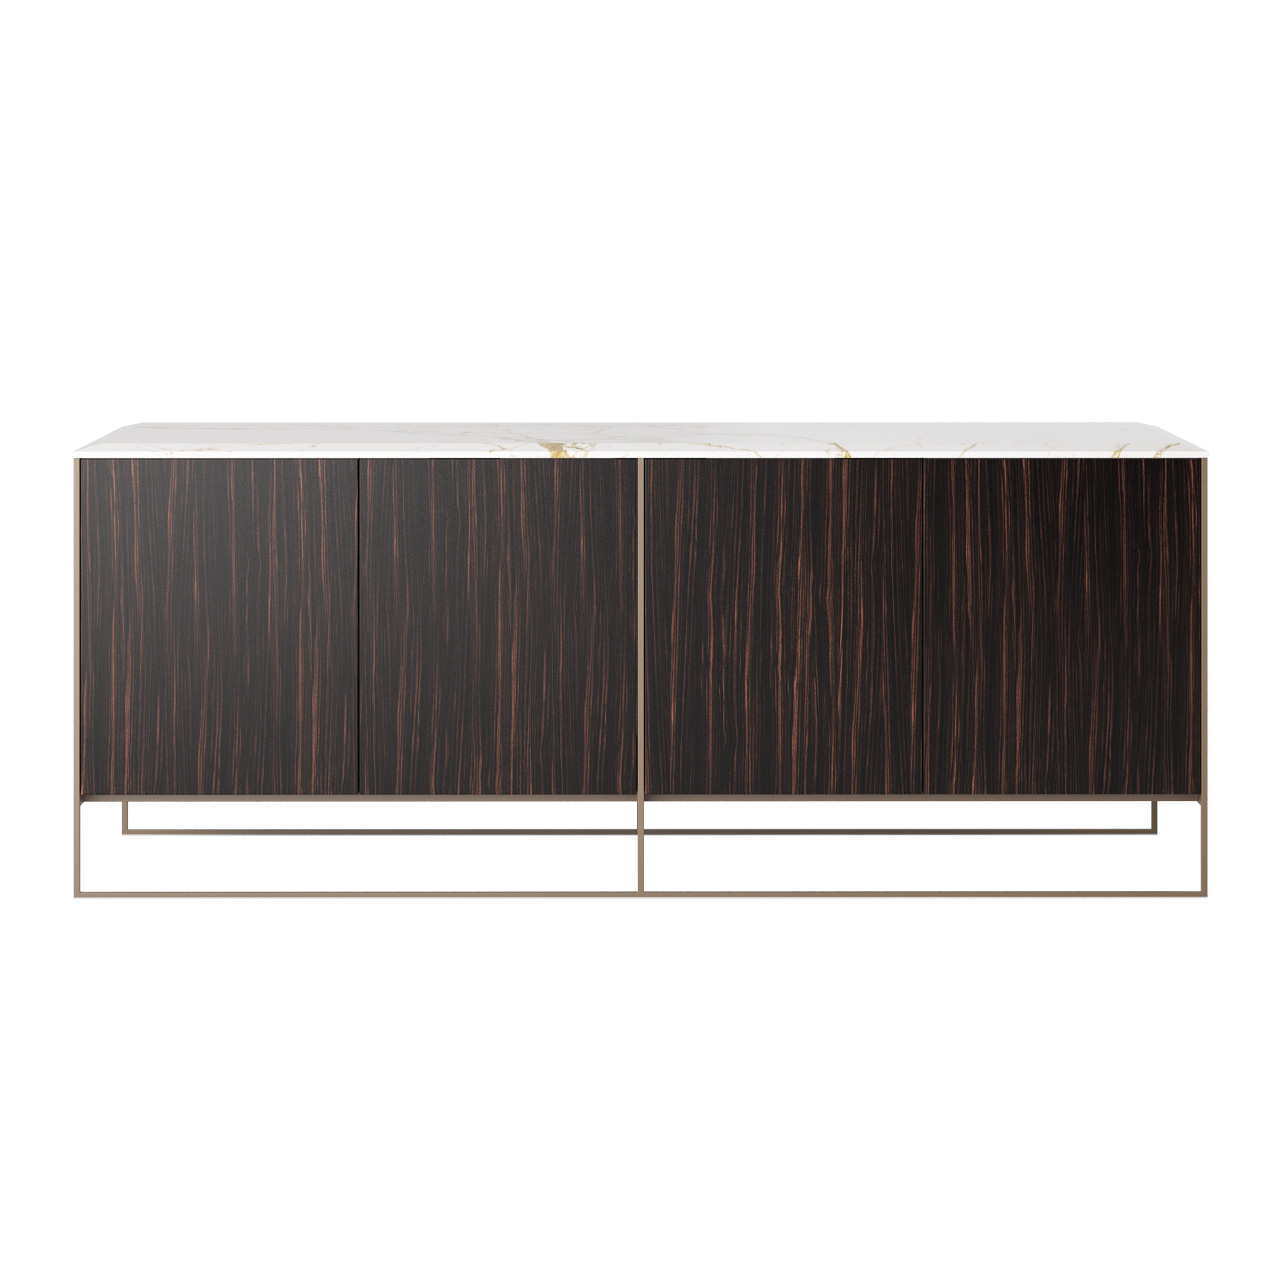 Calder Bronze Sideboard by Minotti